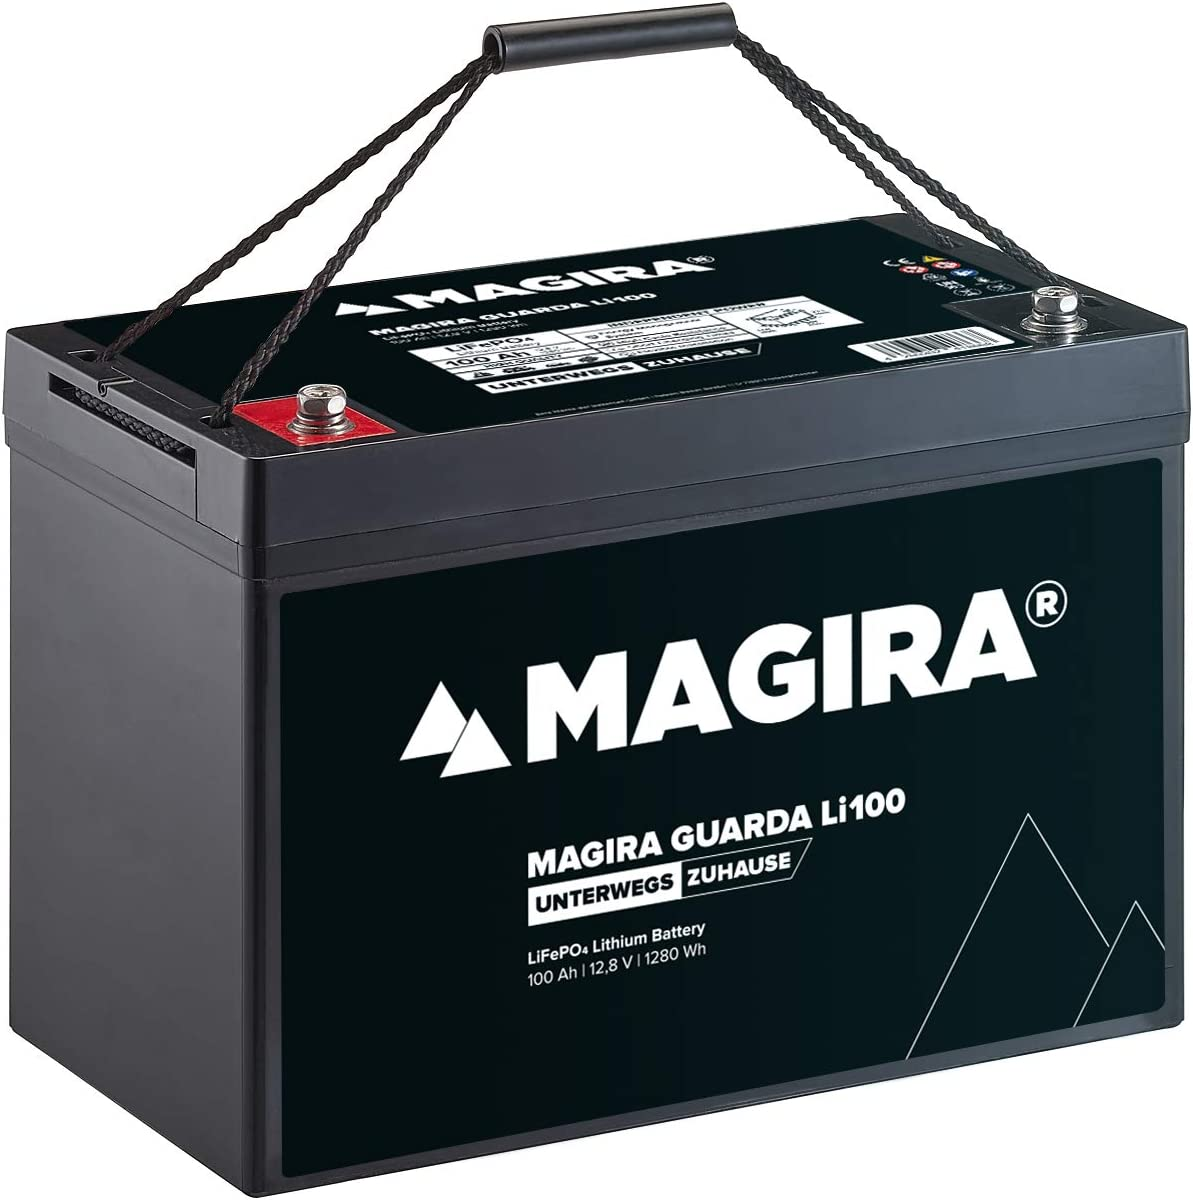 Magira 12v 100ah Lifepo4 Lithium Eisenphosphat Versorgungsbatterie Guarda Li100 Auto